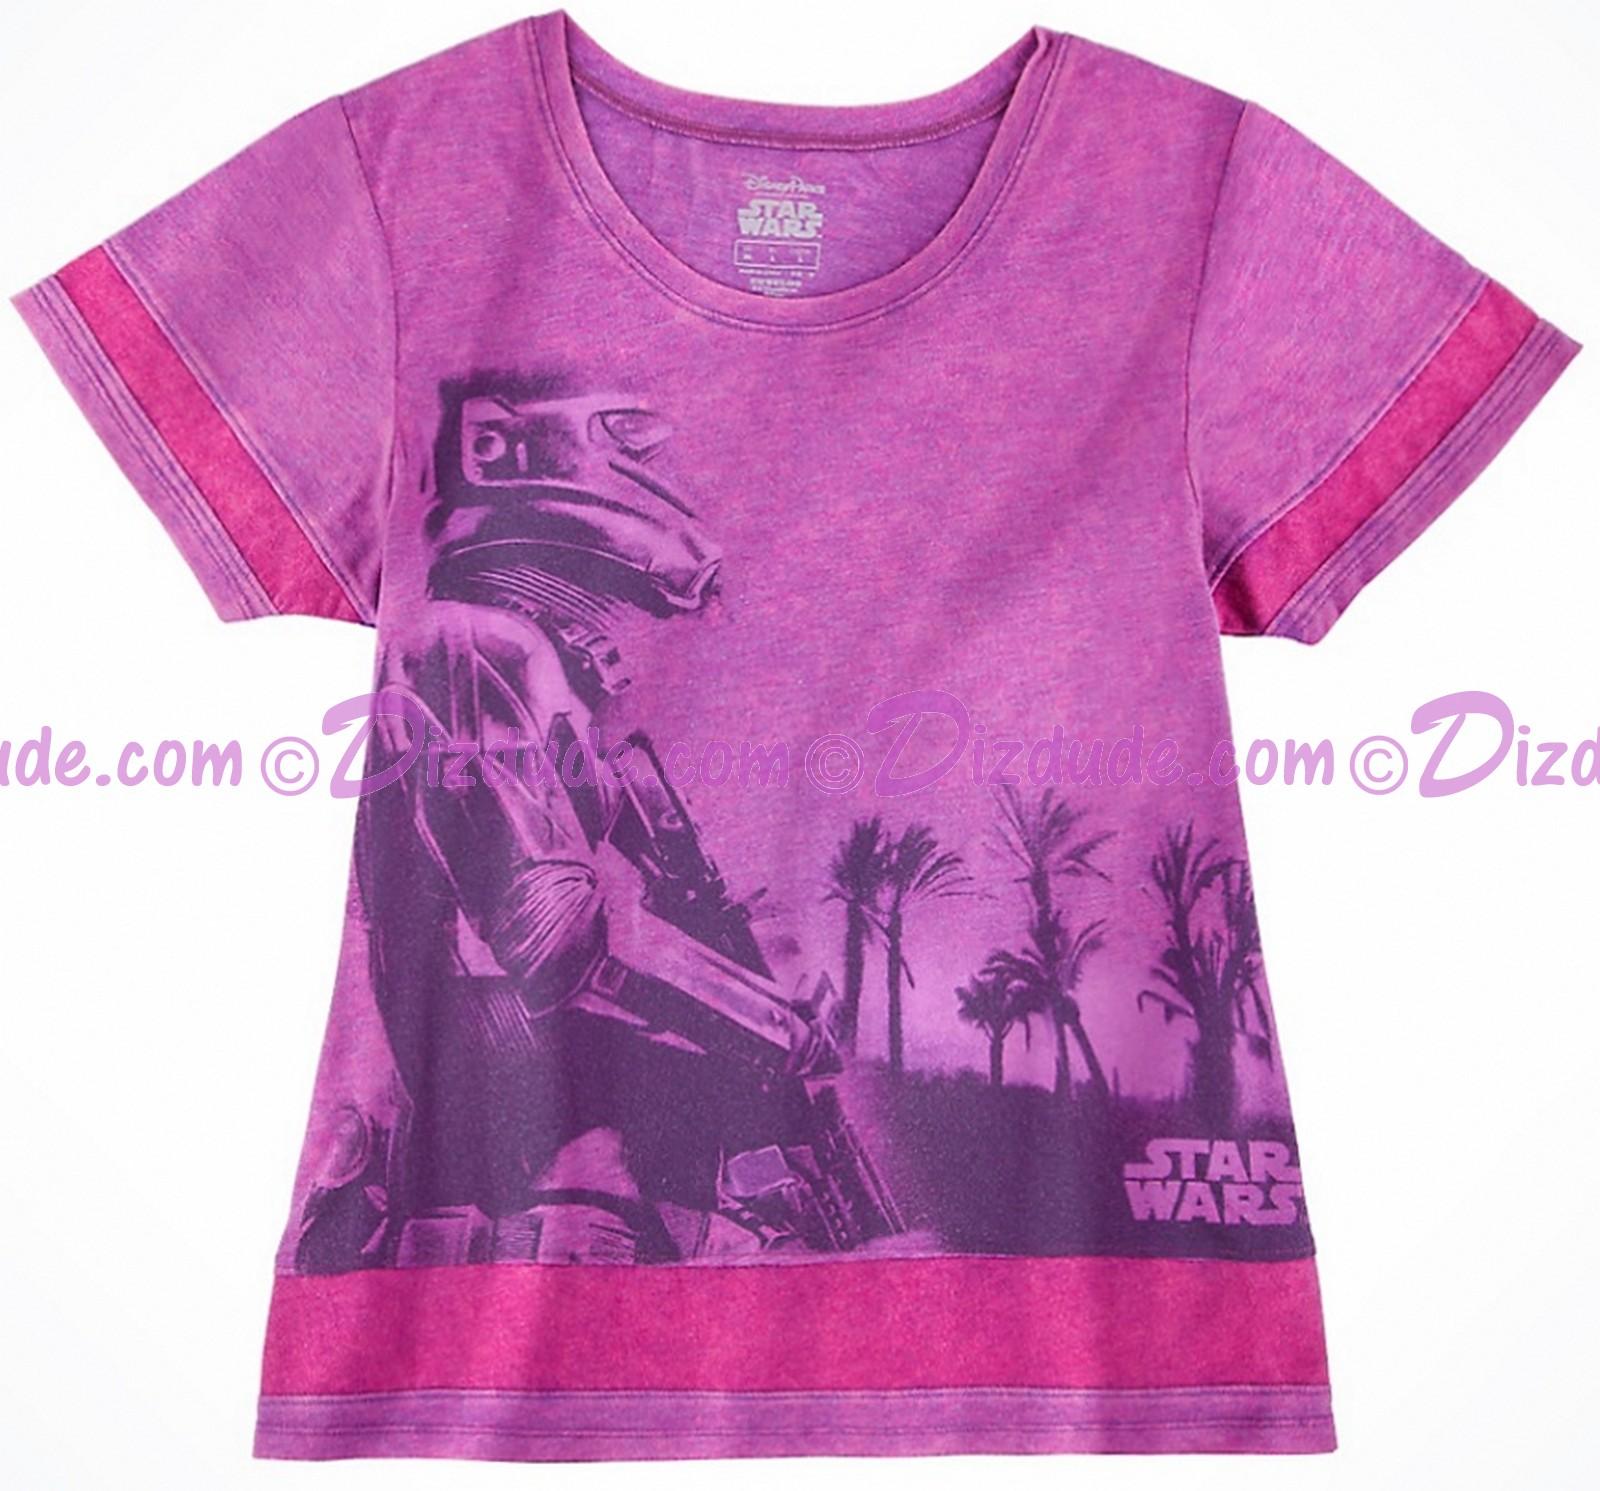 Rogue One Shoretrooper Adult T-Shirt (Tshirt, T shirt or Tee) - Disney's Star Wars © Dizdude.com